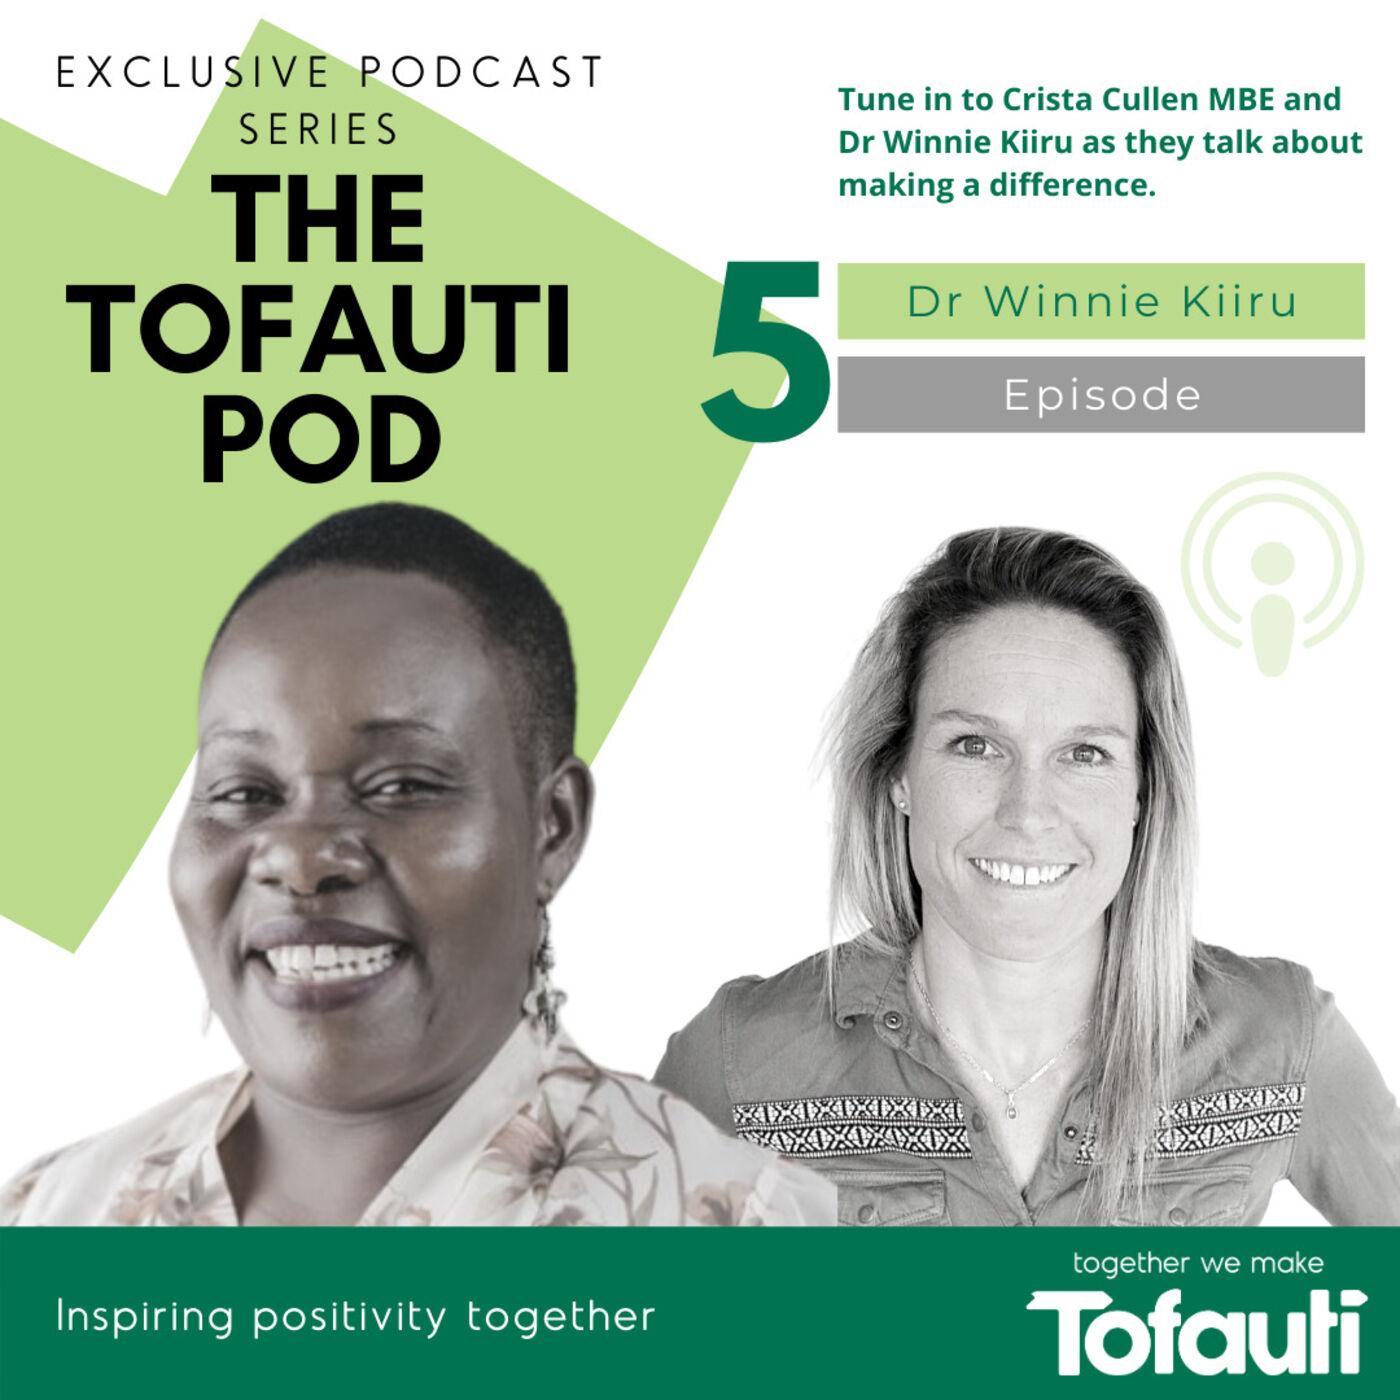 Episode Five - Dr Winnie Kiiru, Stop Ivory